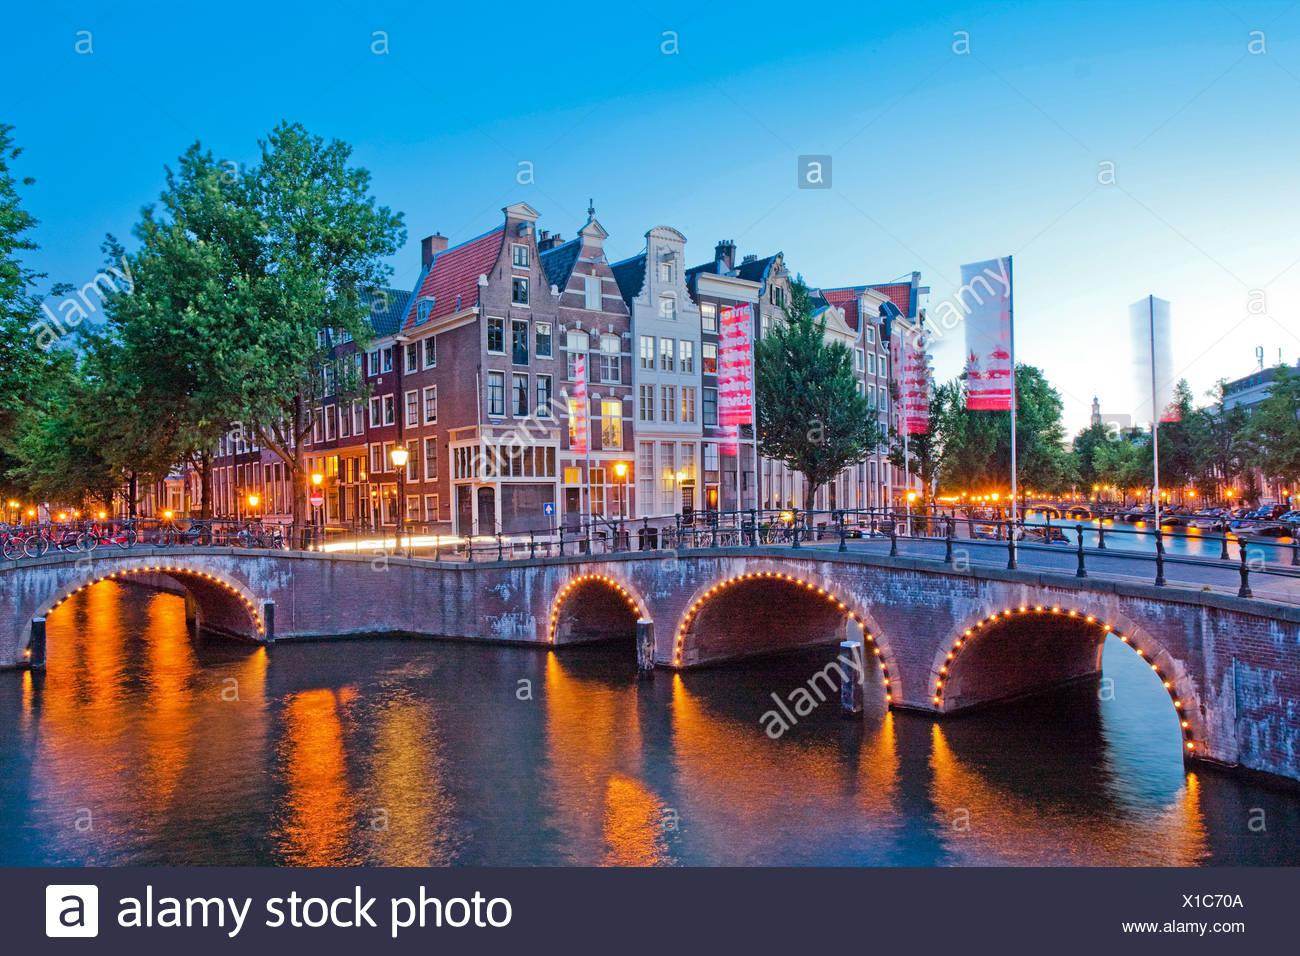 Holland, Netherlands, Europe, Amsterdam, Keizergracht, canal, channel, bridge, in, evening - Stock Image